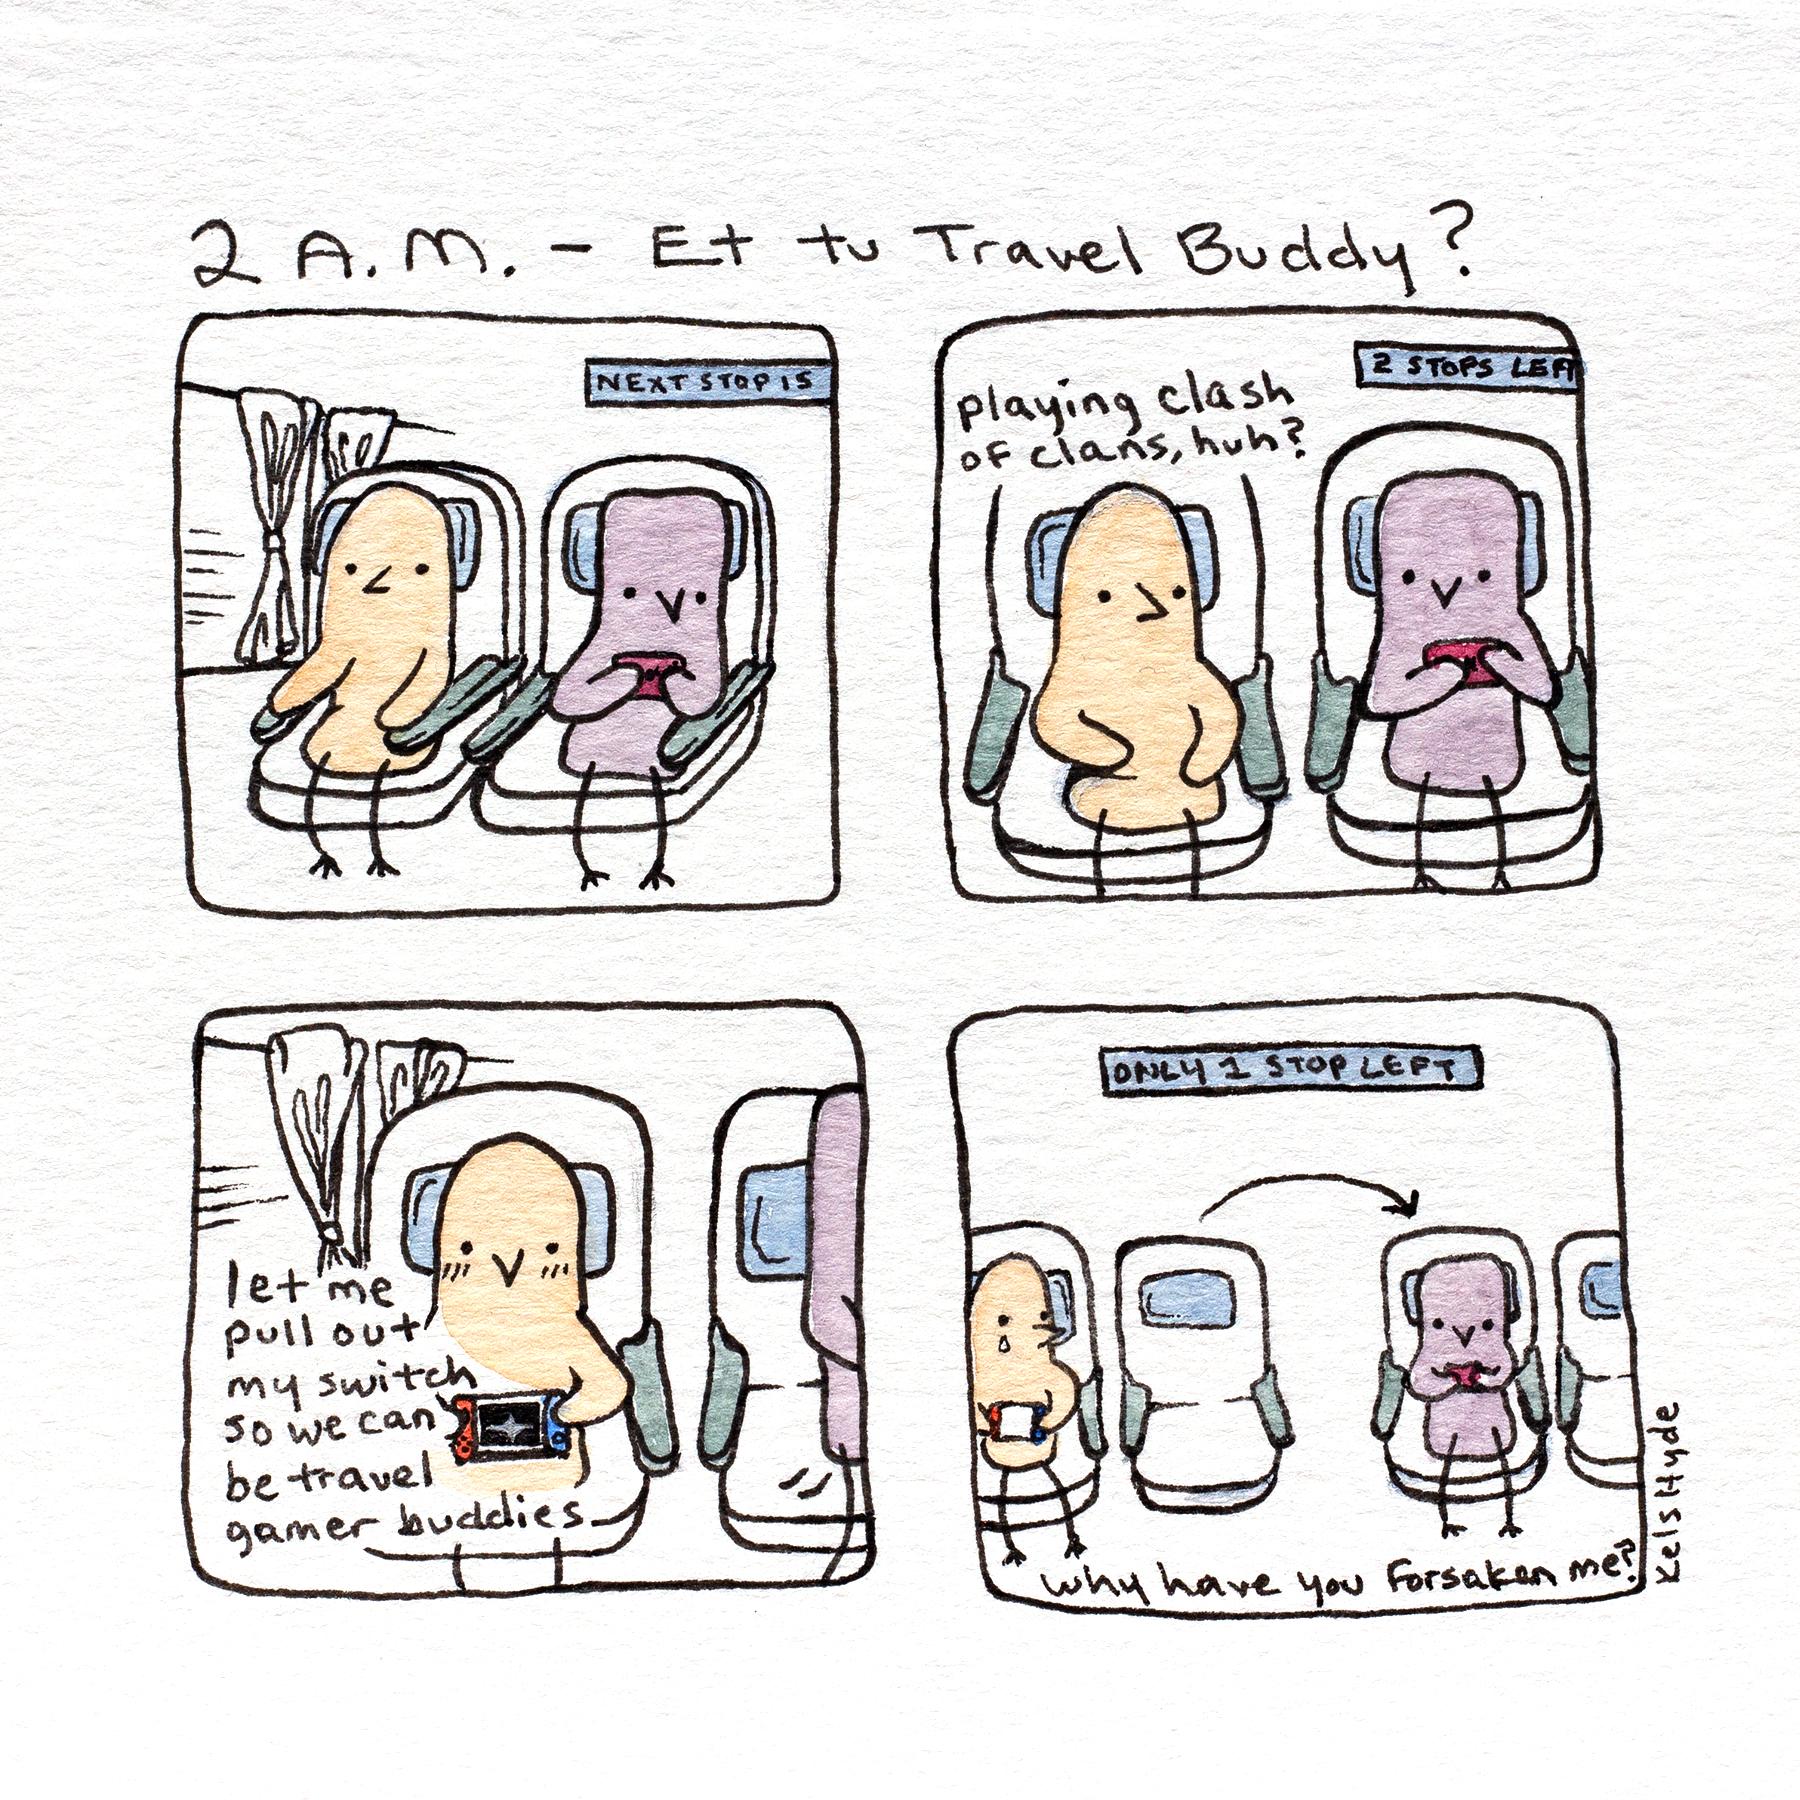 birb-travel buddy 2.jpg